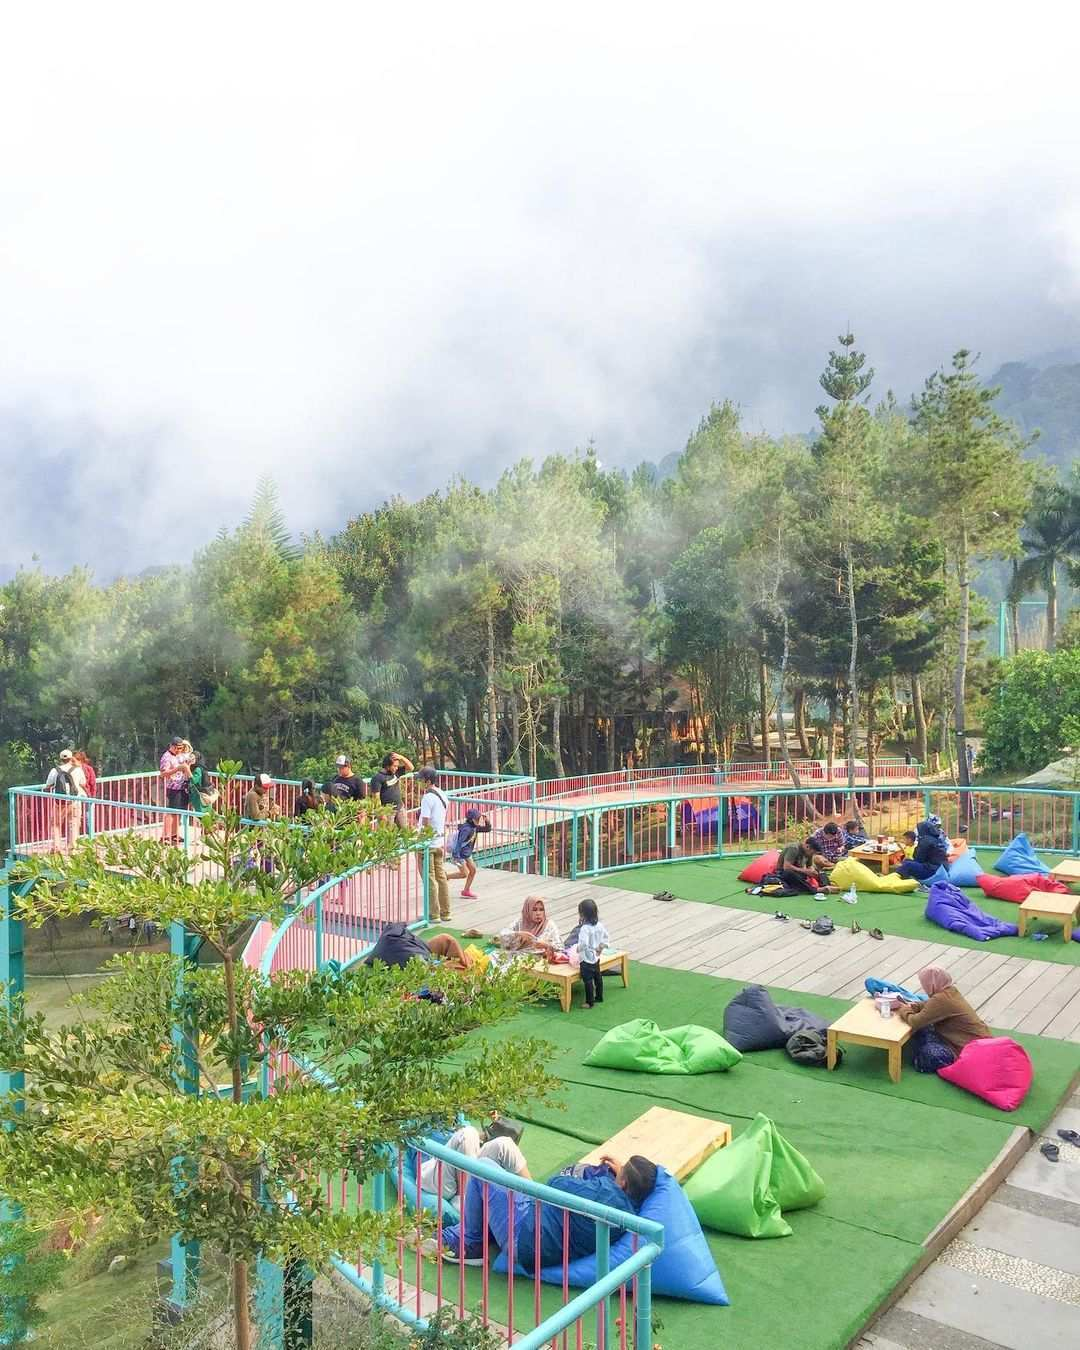 Suasana Kopi Kabut di Wisata Alam Sevilage, Image From @stsumiati21_